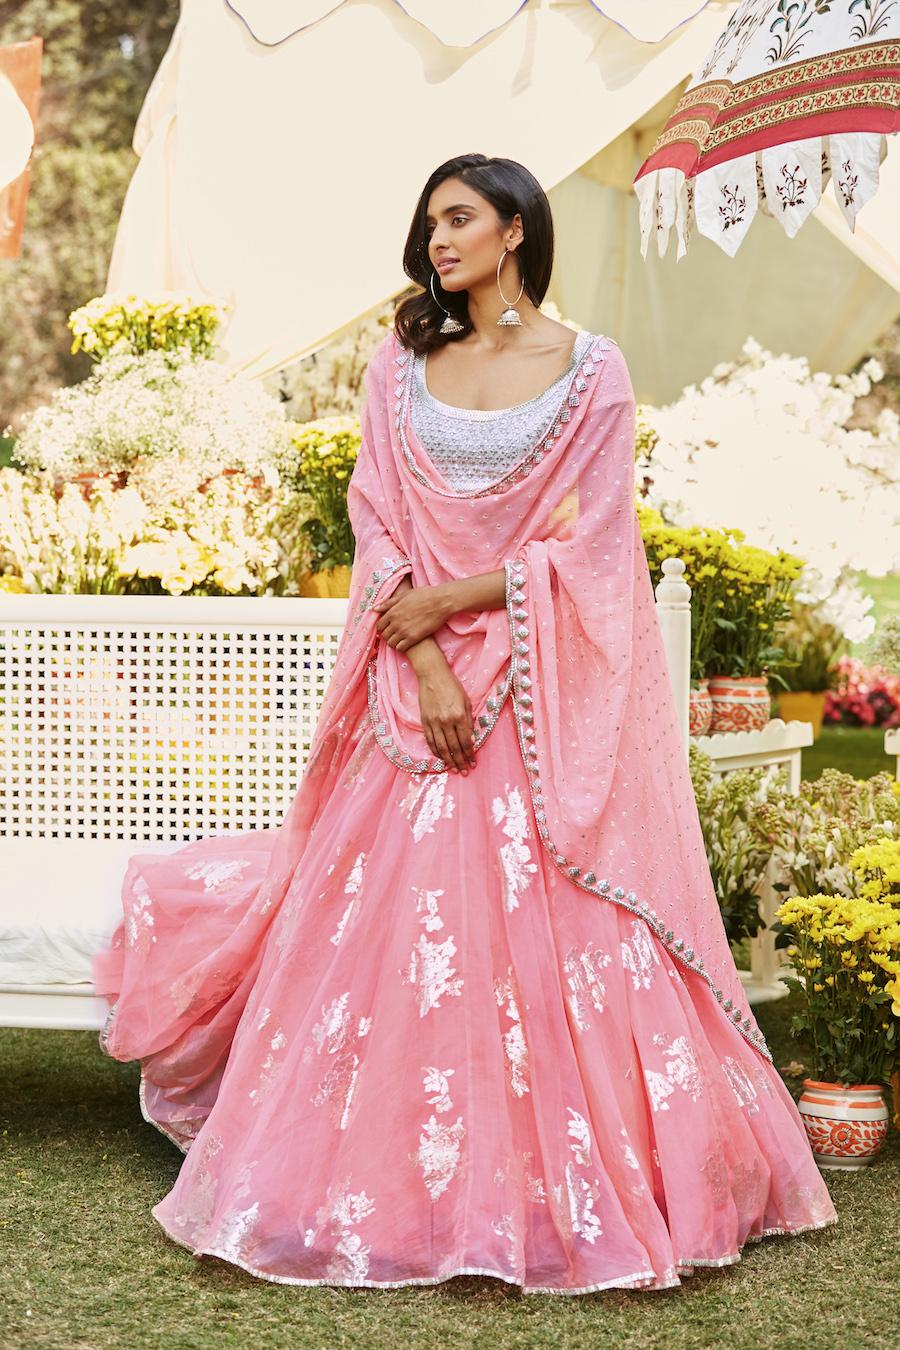 Pastel Pink Bridal Lehenga- Abhinav Mishra, Shahpur Jat Boutiques.